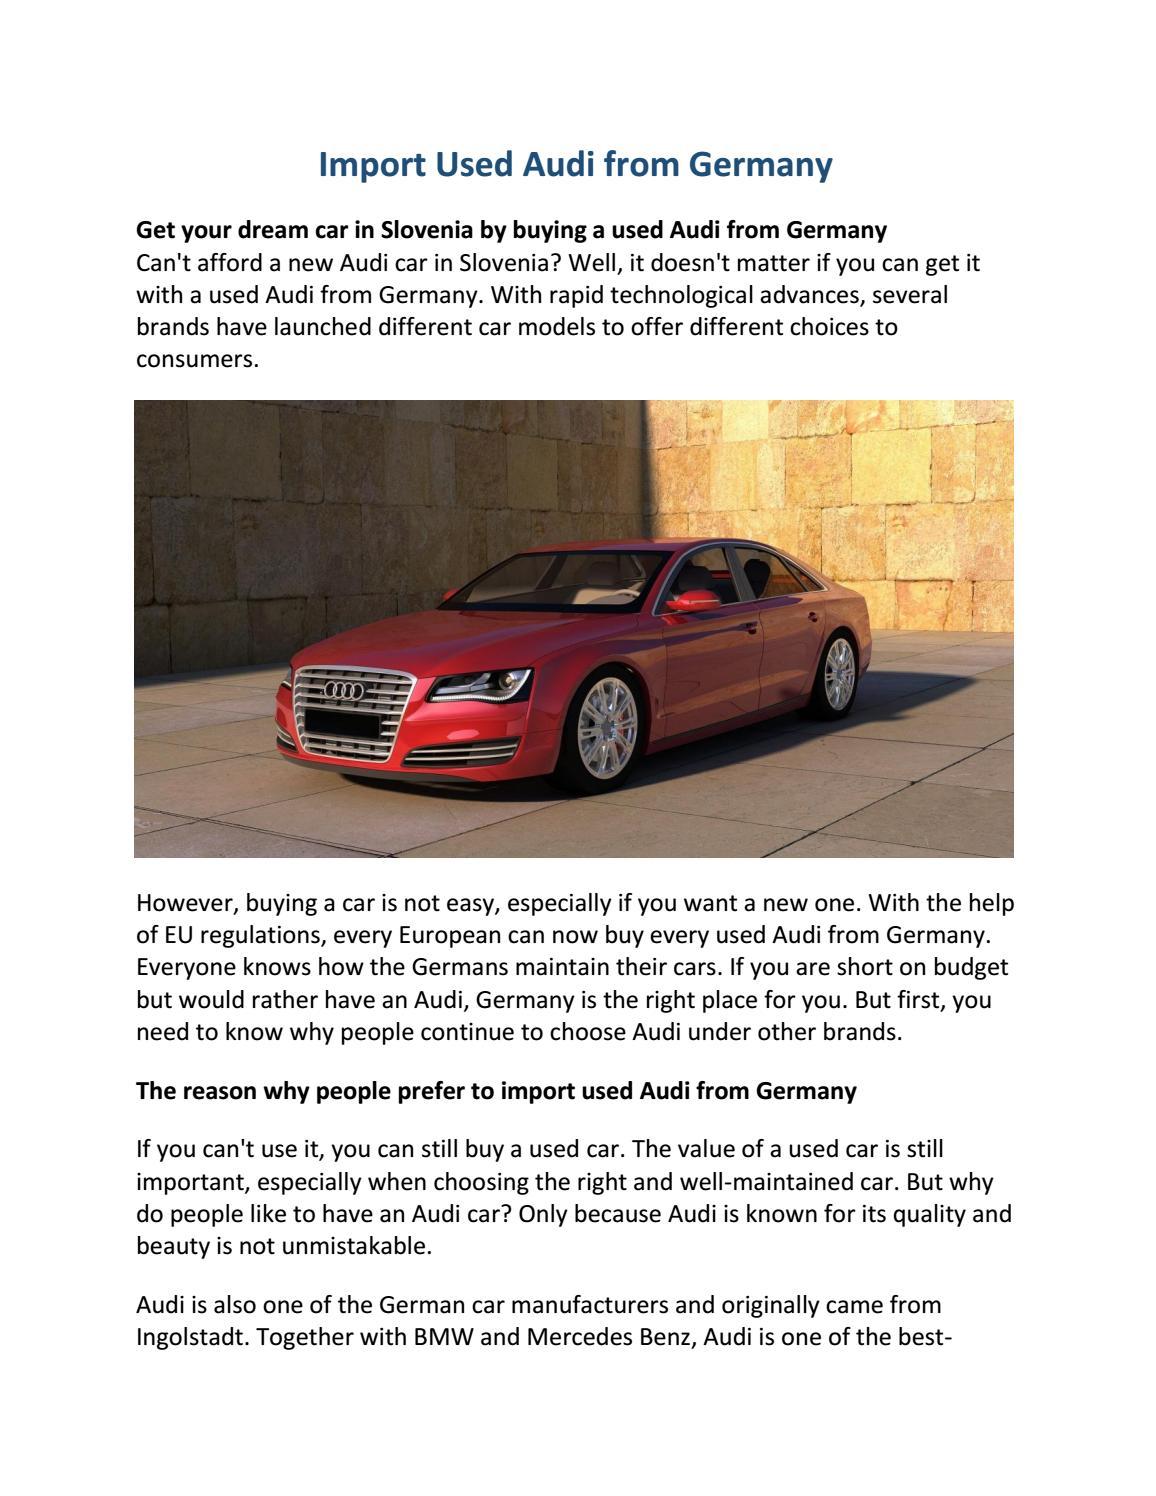 Import Used Audi From Germany By Avtonetnemcija Issuu